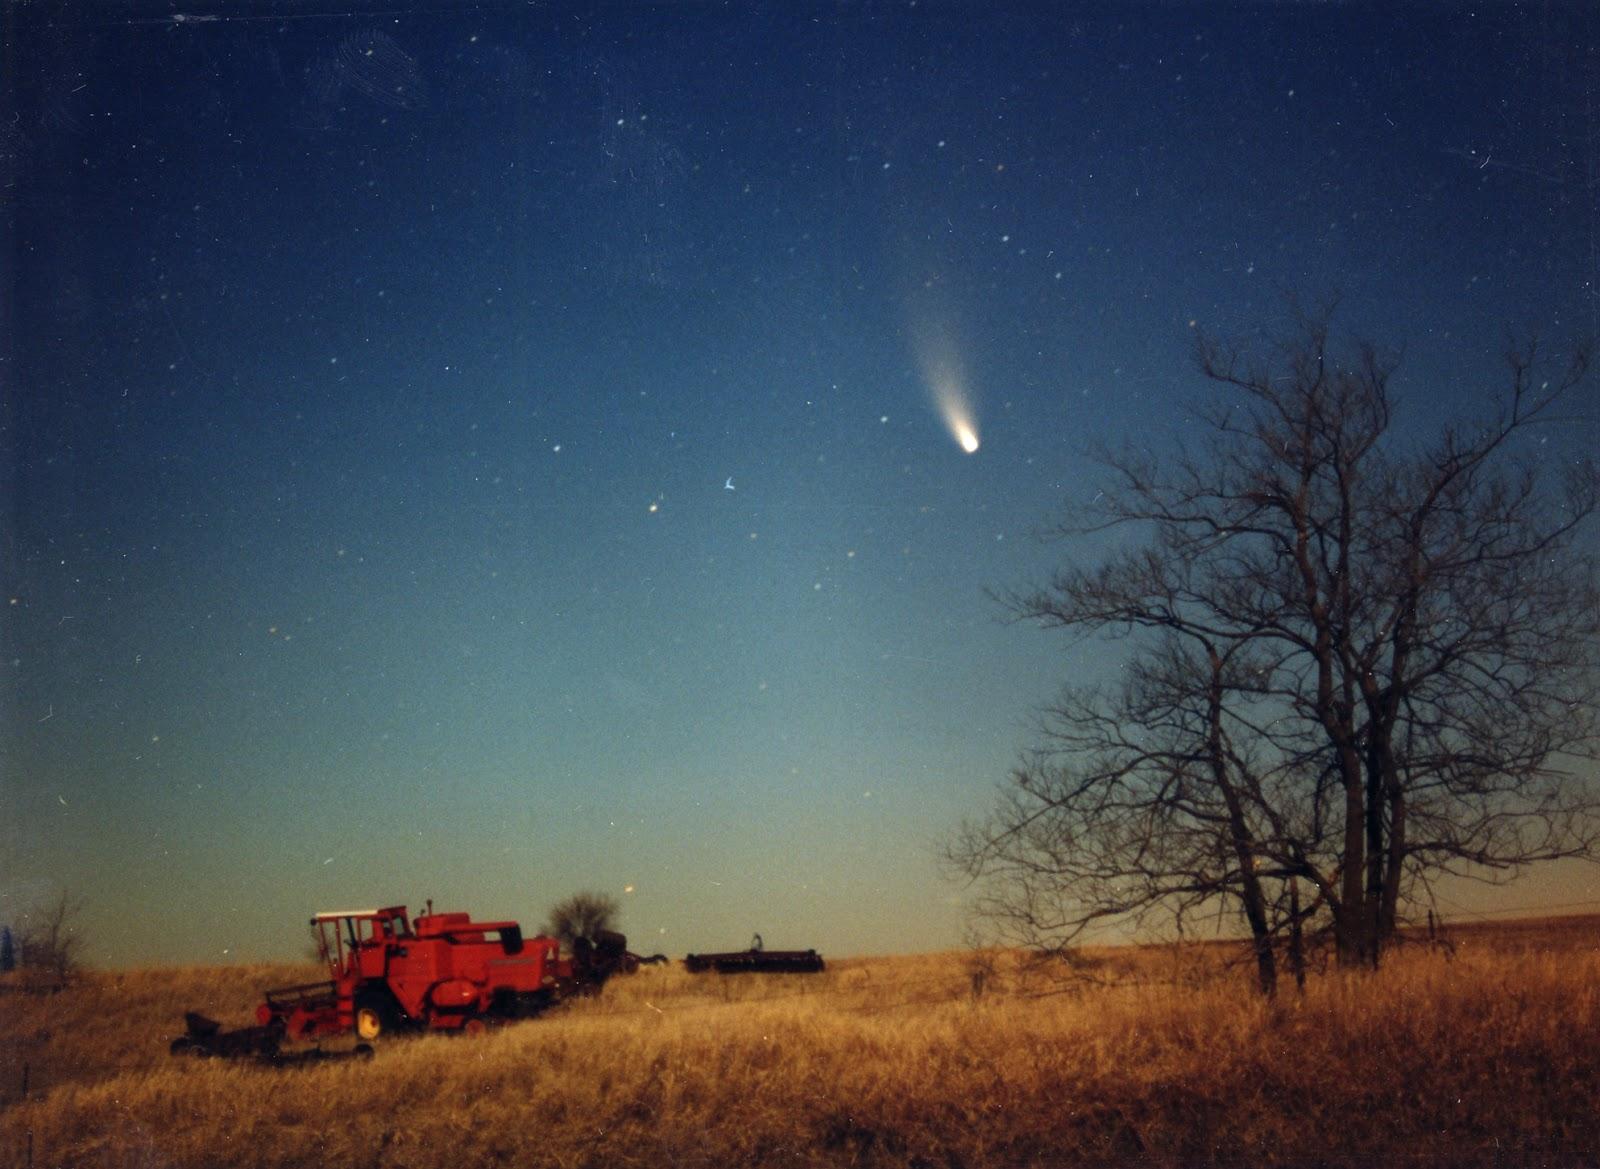 комета хейла-боппа 1997 фото россия